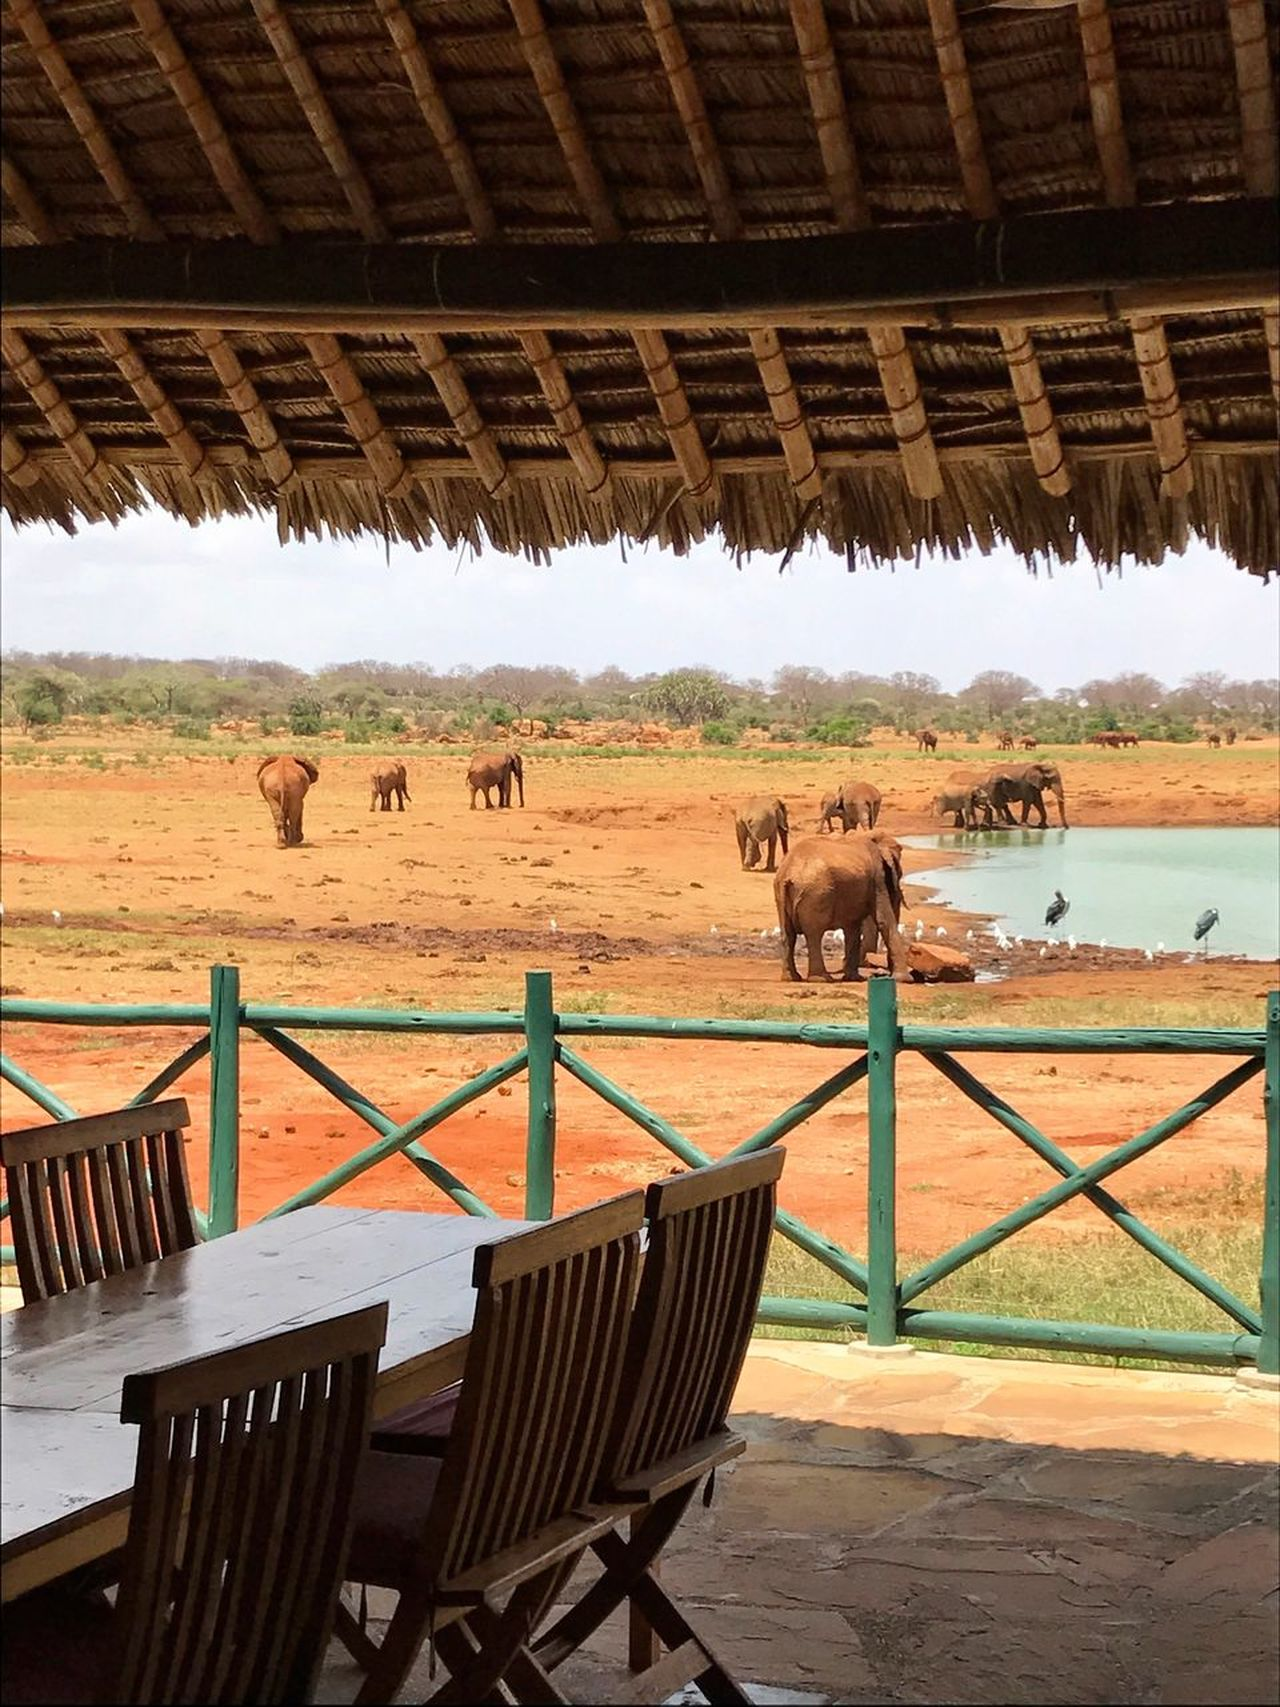 Animal Themes Water Large Group Of Animals Togetherness Elephants Waterhole Elephant Safari Animals Amboseli African Beauty Freedom Animals In The Wild Savannah Africa Safari Scenics Kenya Landscape African Lodge Lodge Tranquil Scene Nature